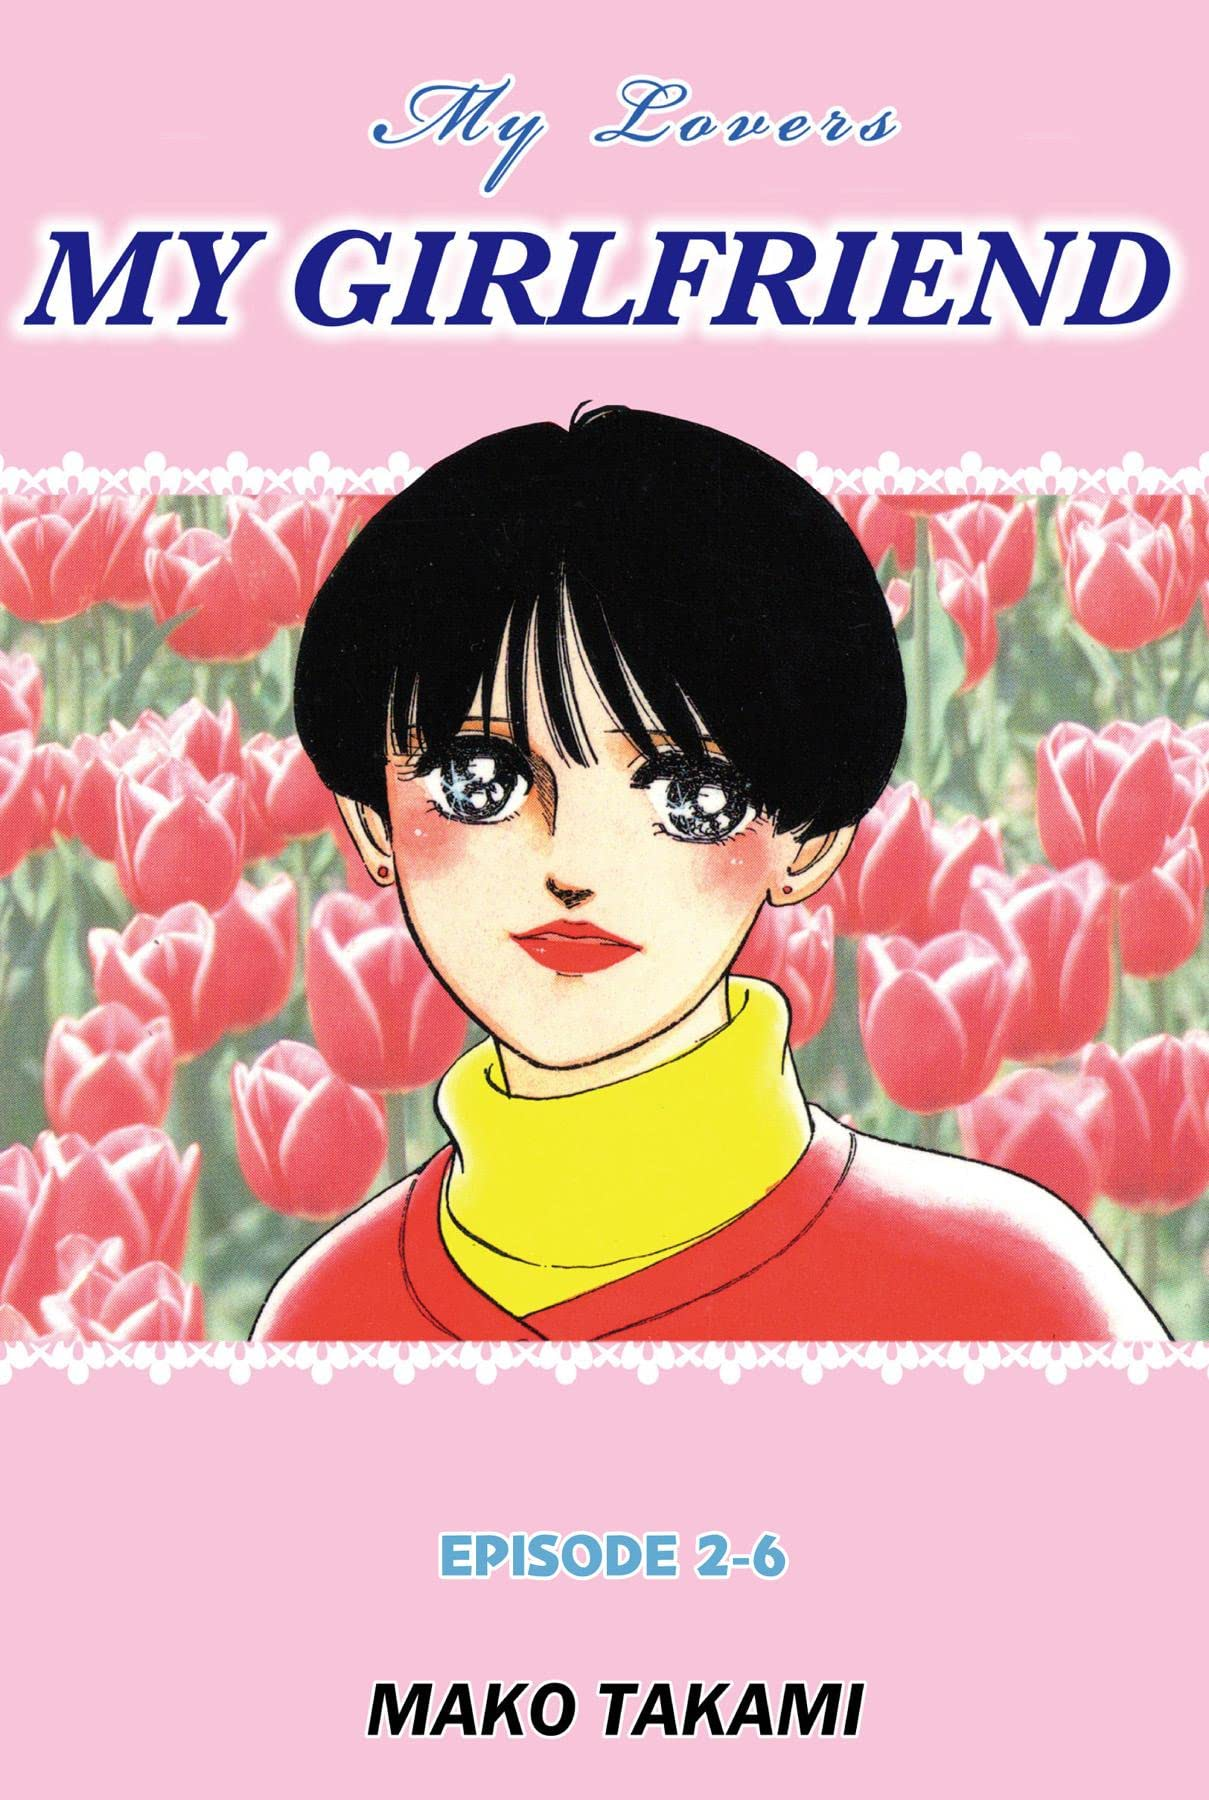 MY GIRLFRIEND #13